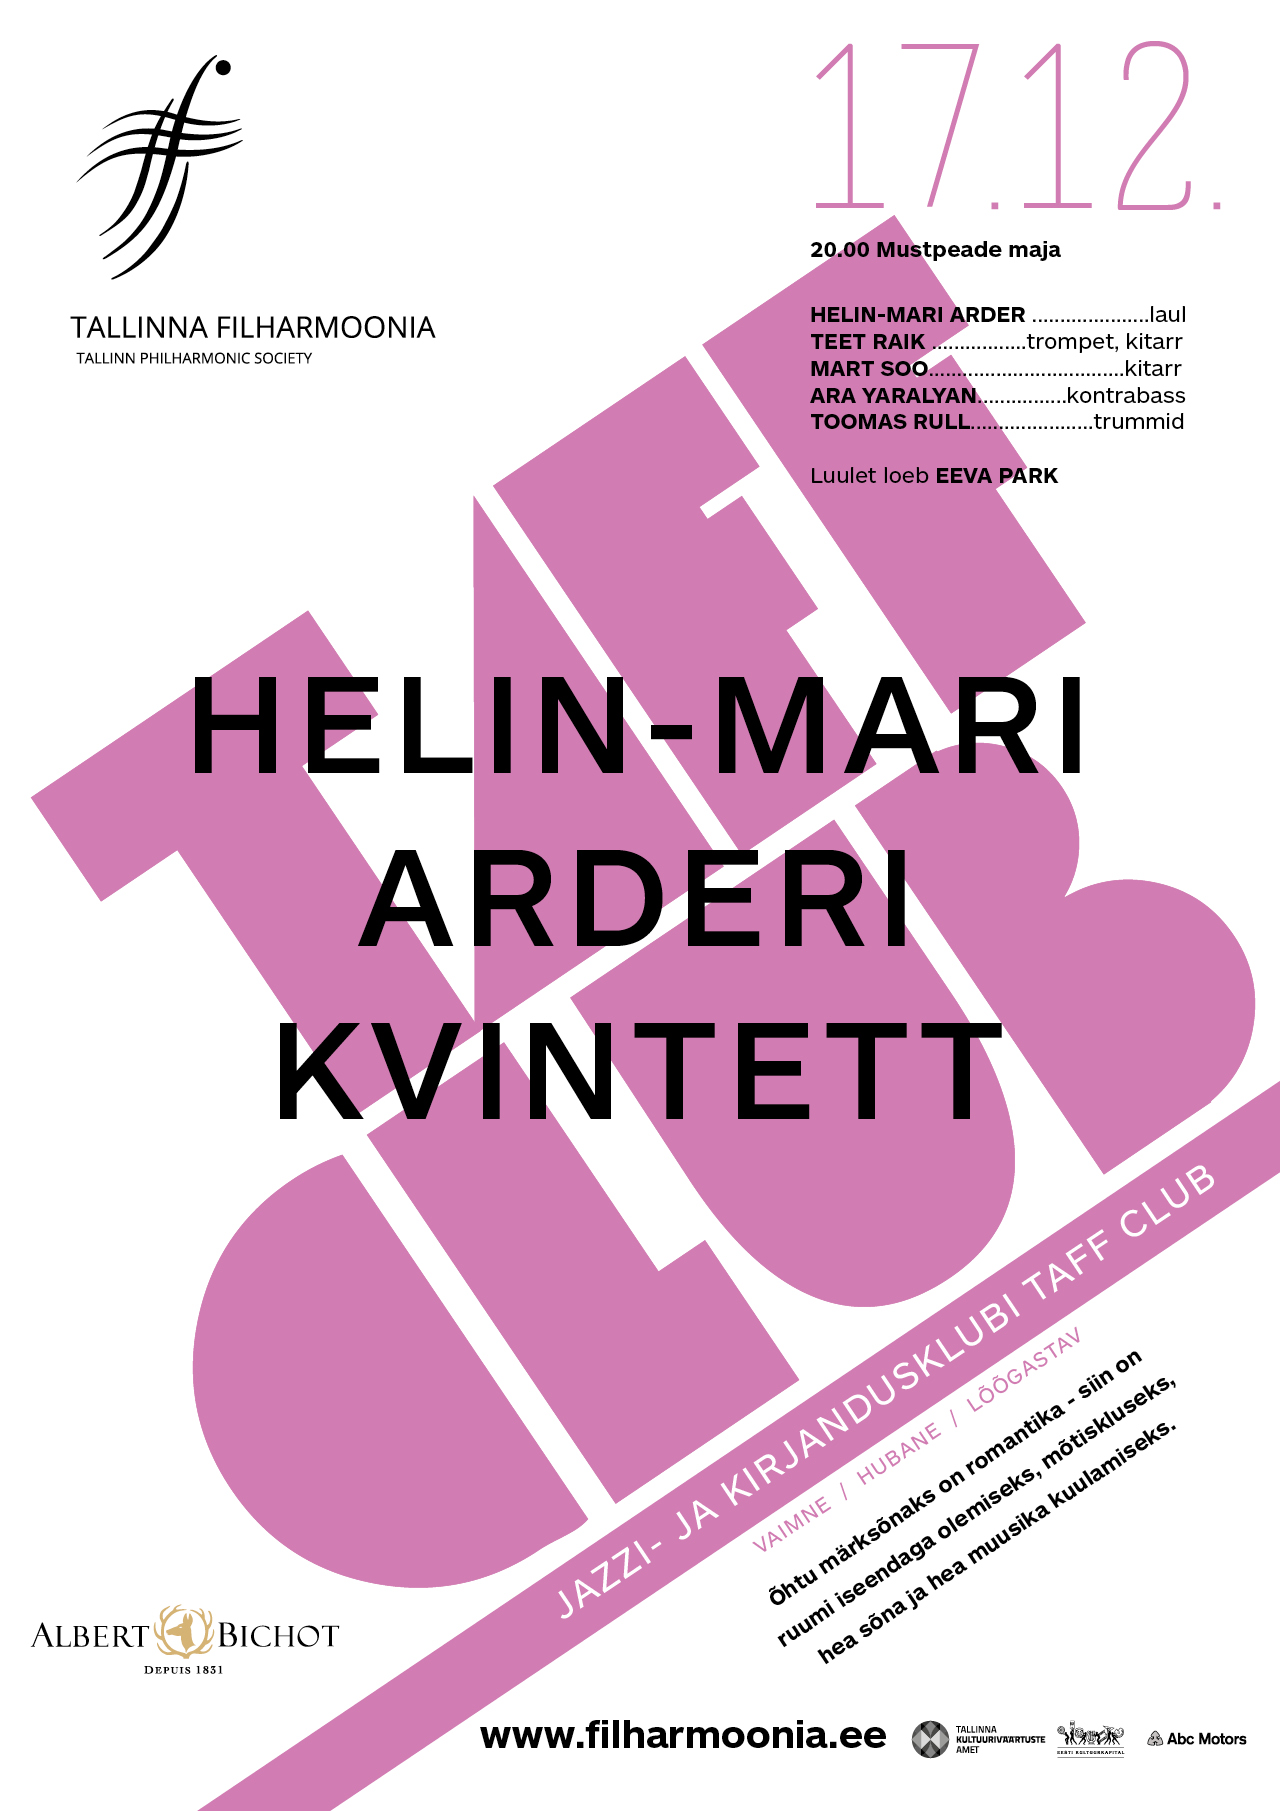 TAFF CLUB. HELIN-MARI ARDERI KVINTETT